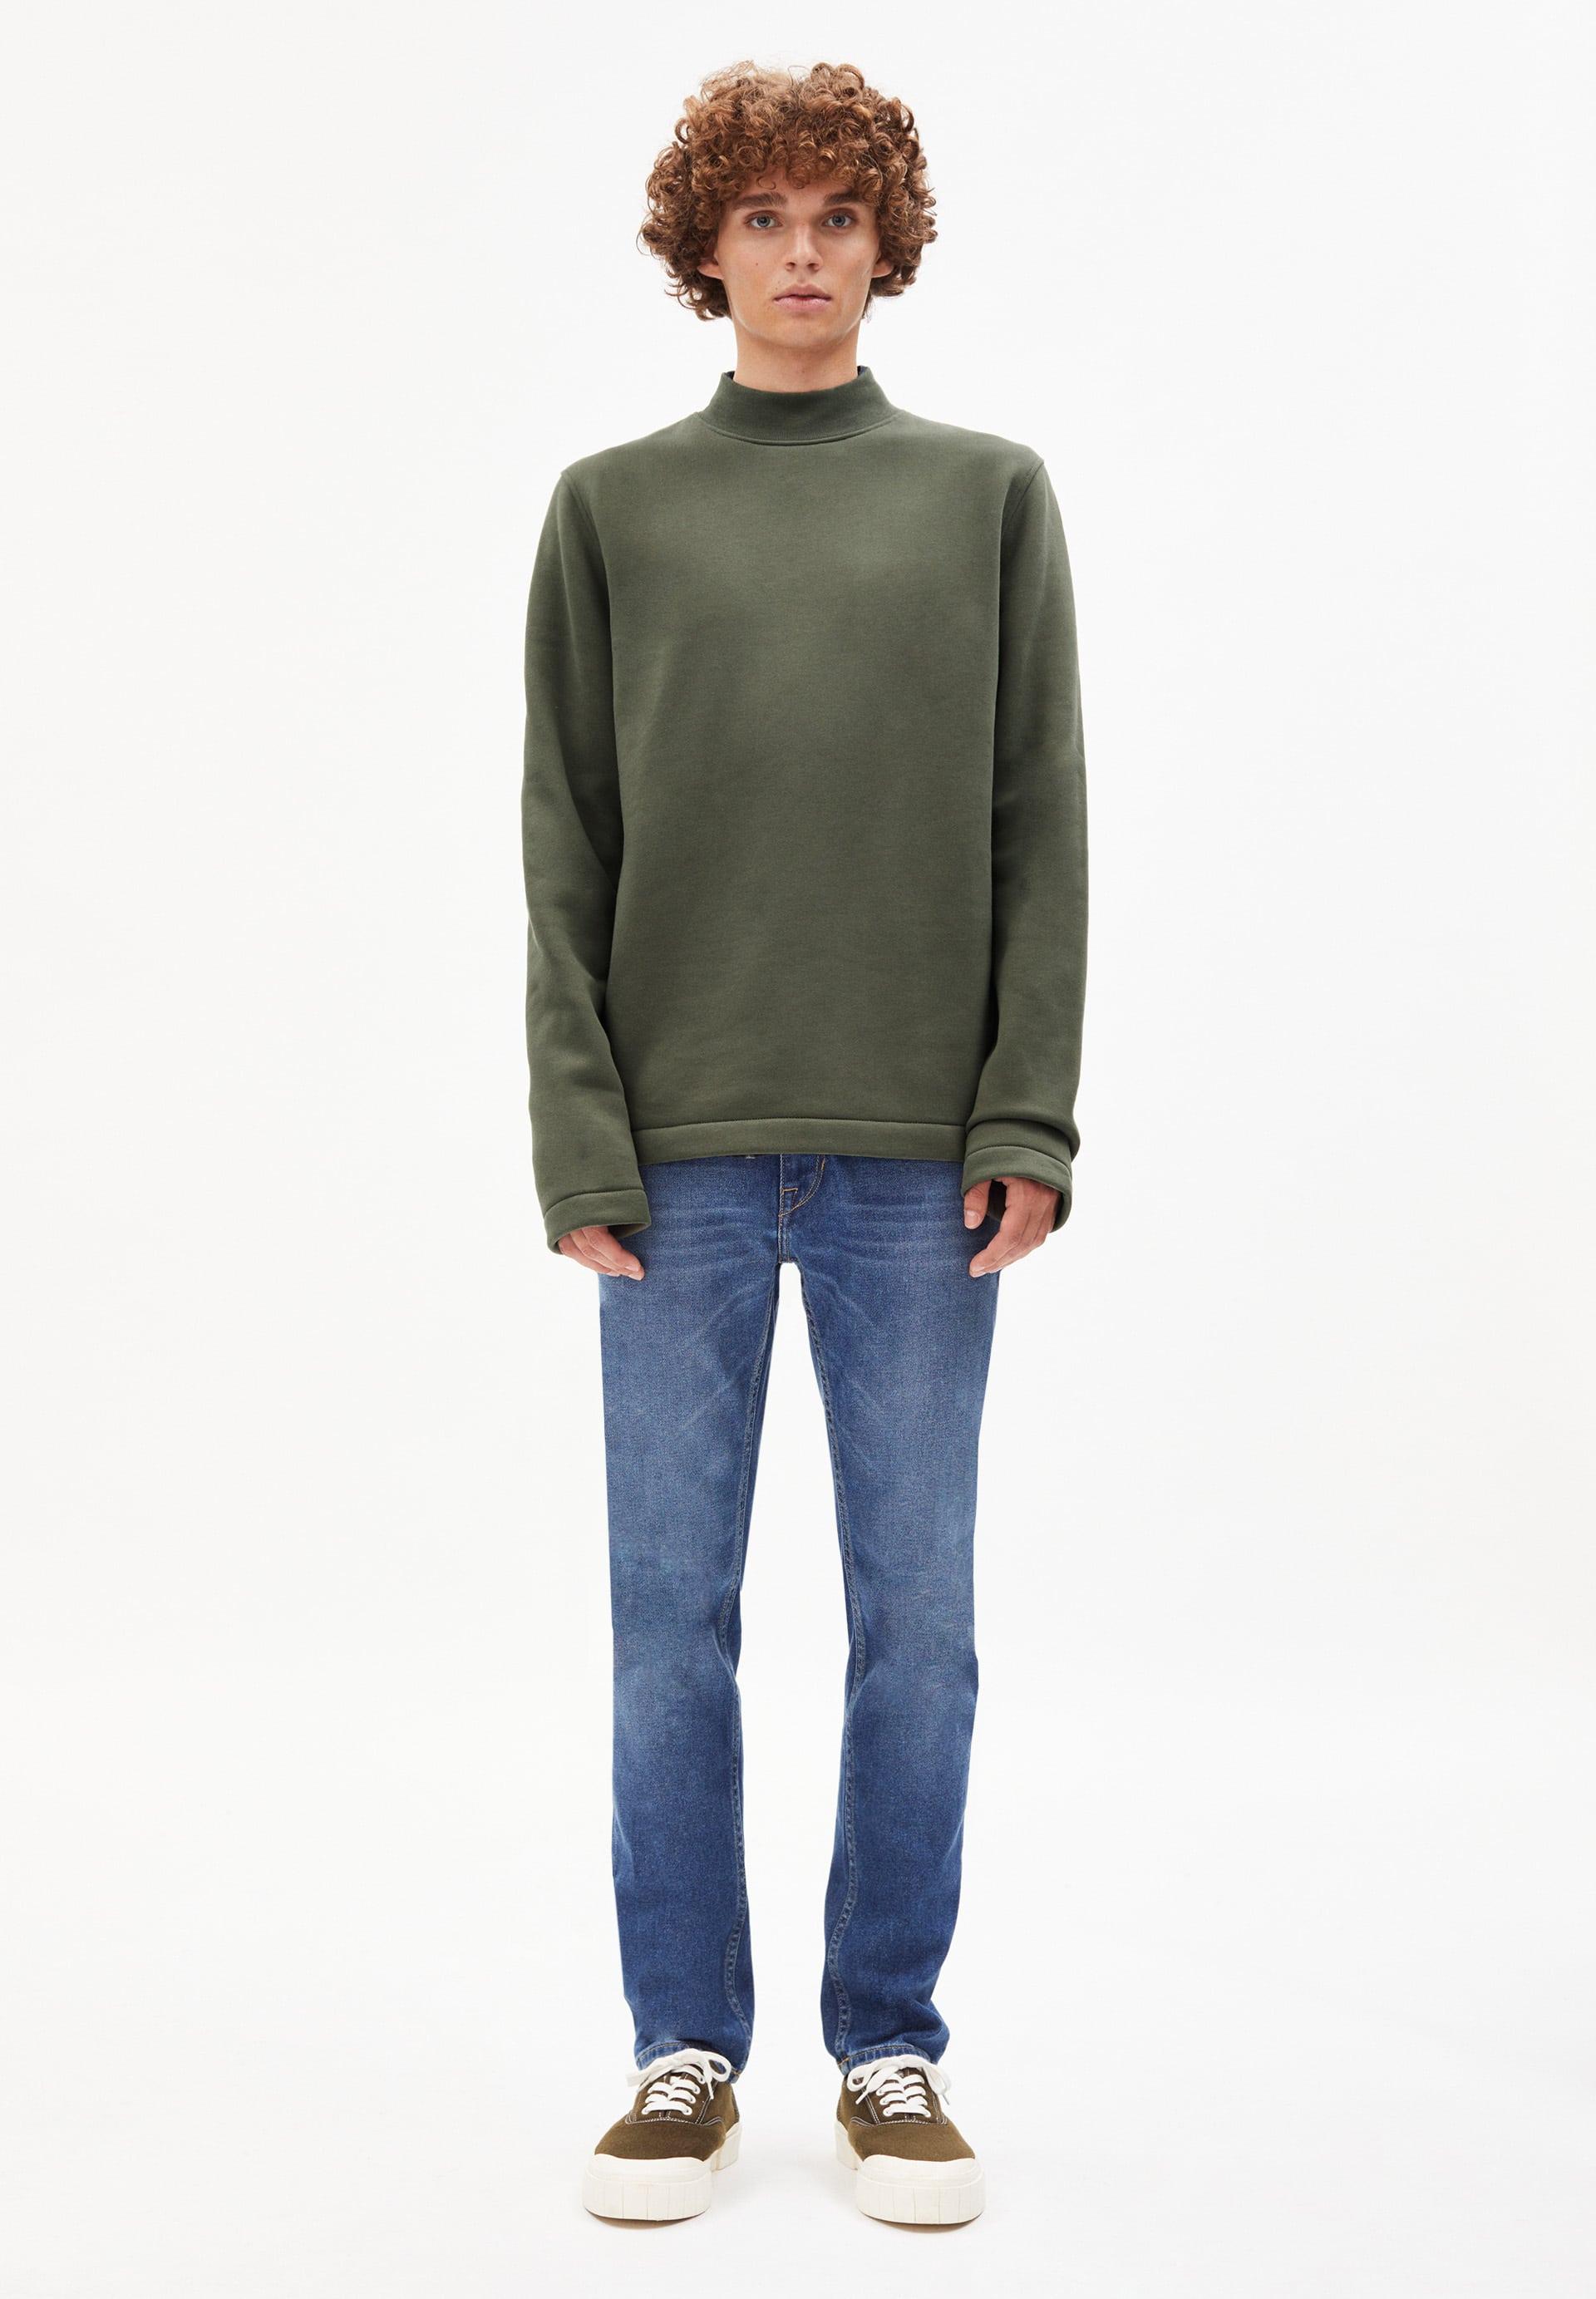 LOTHAAR SOFT Sweat-shirt en coton biologique